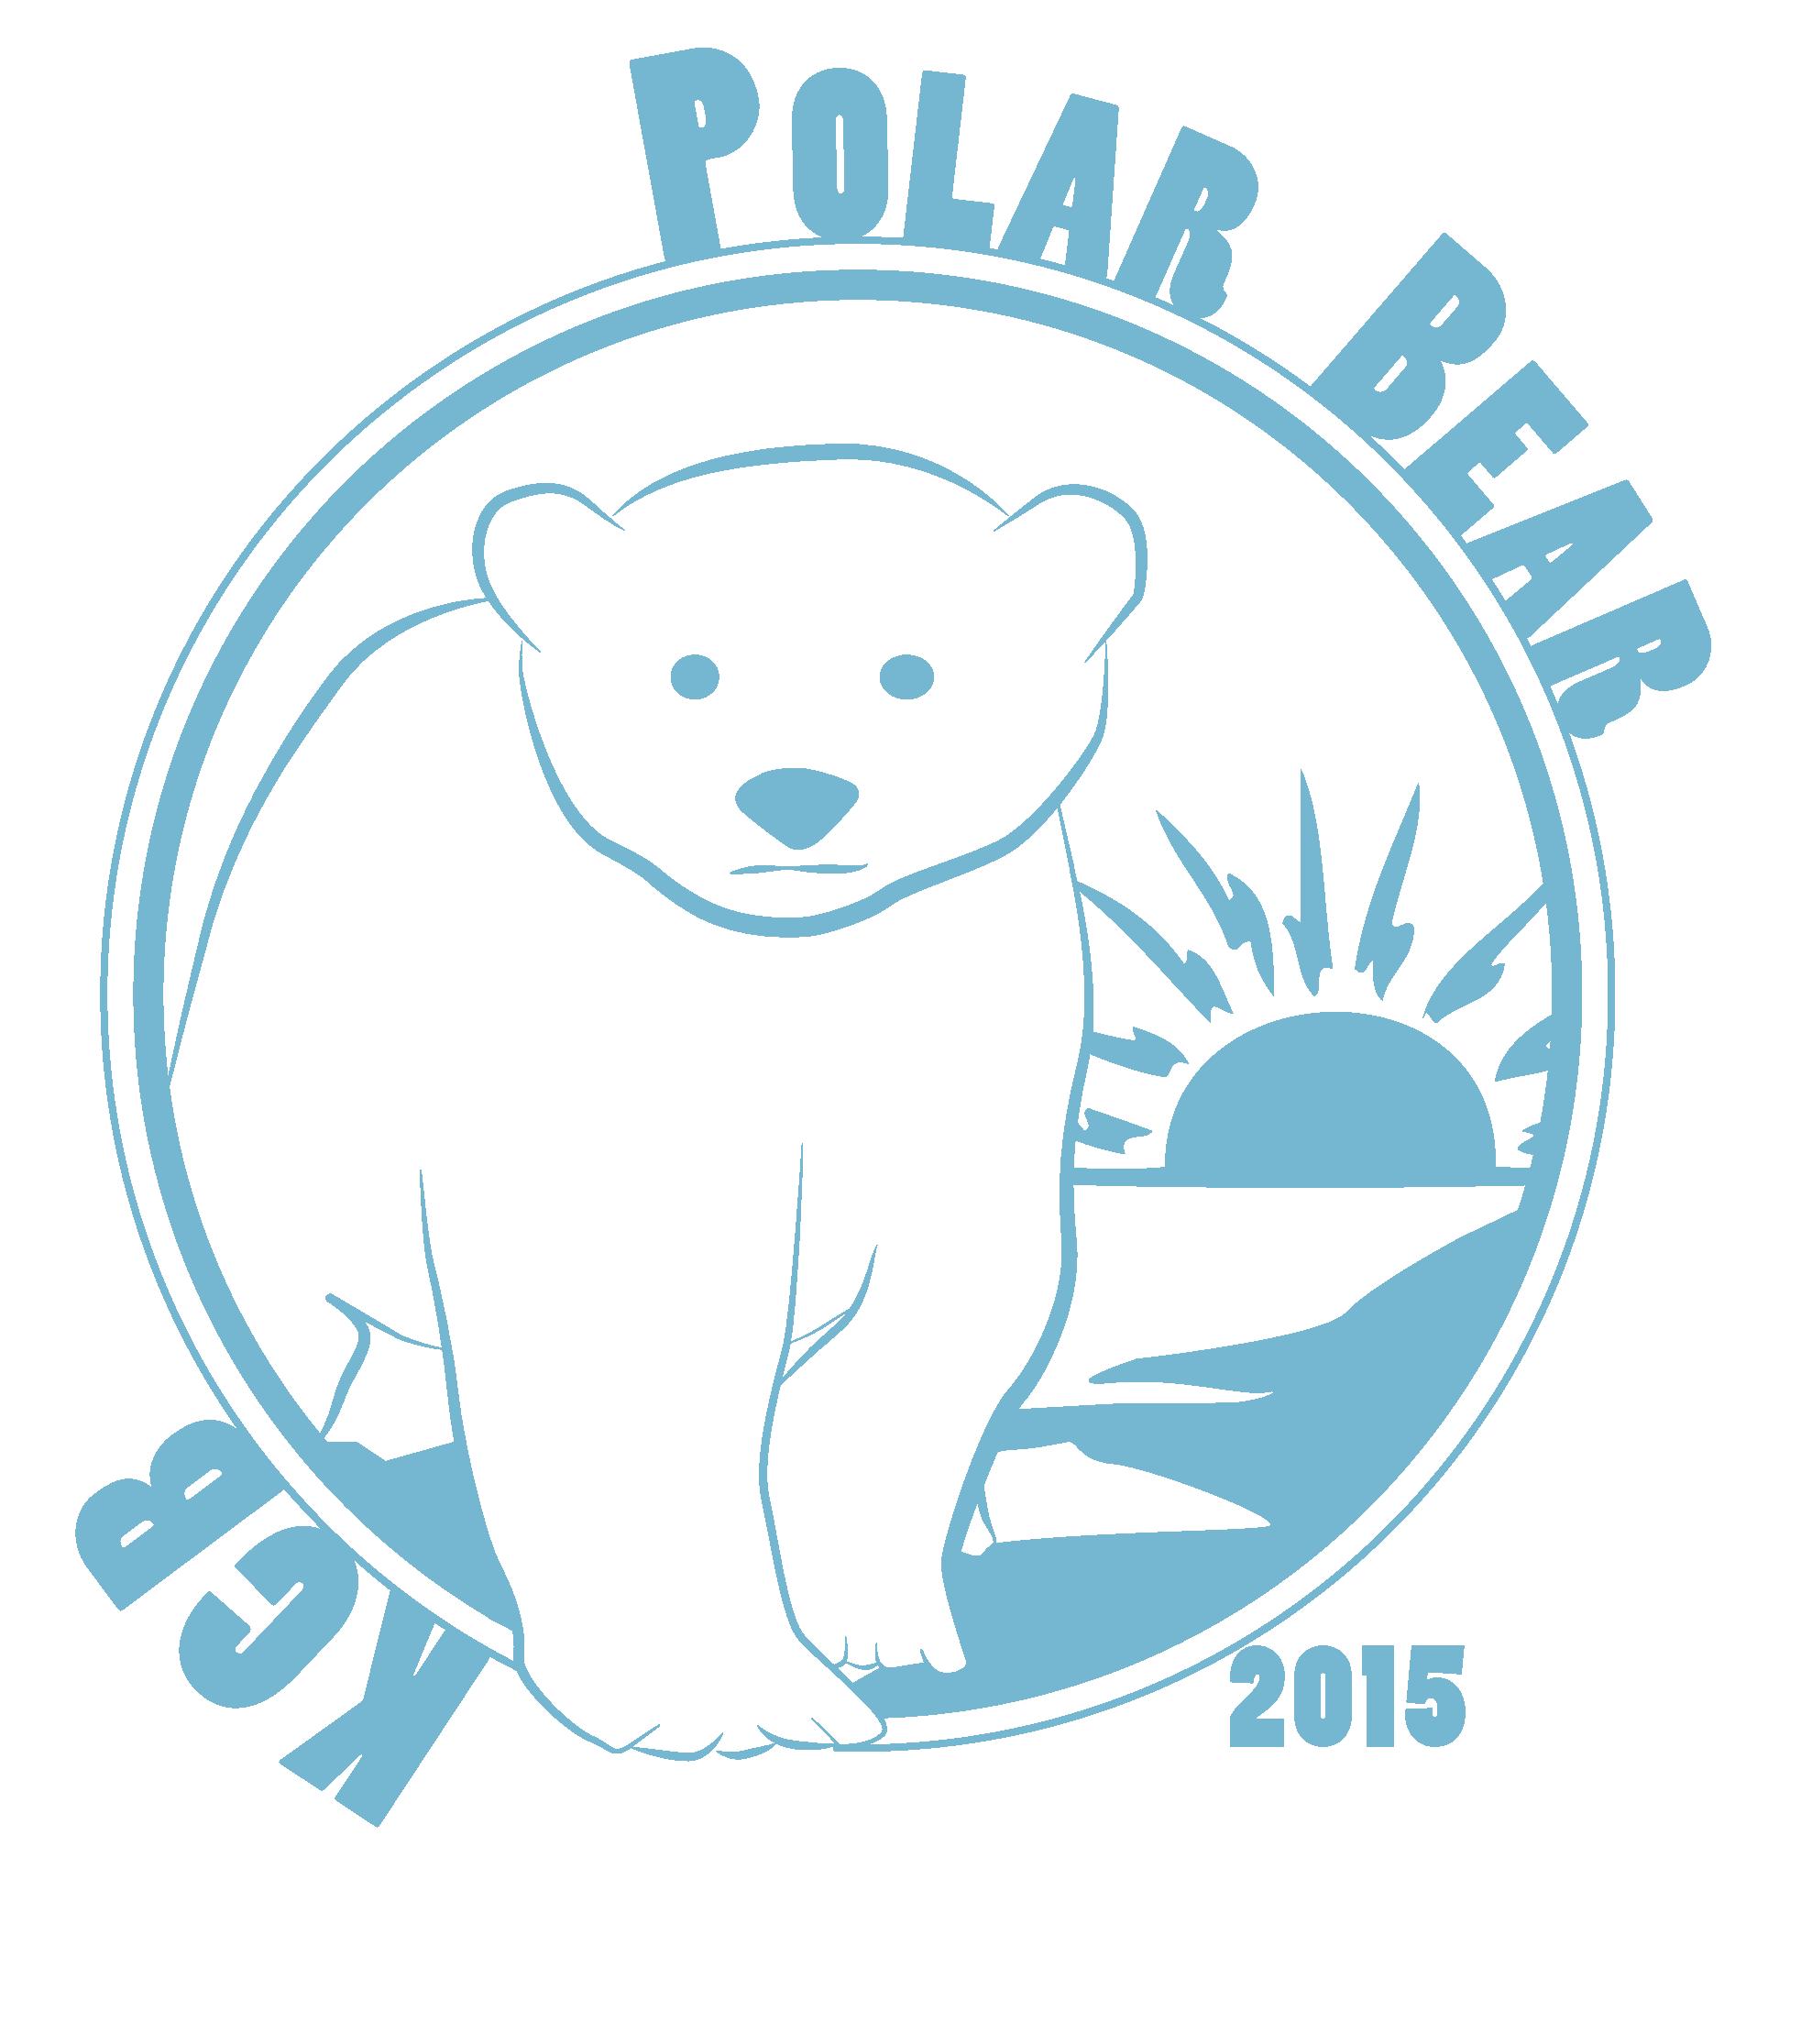 polar bear logo 2015 blue